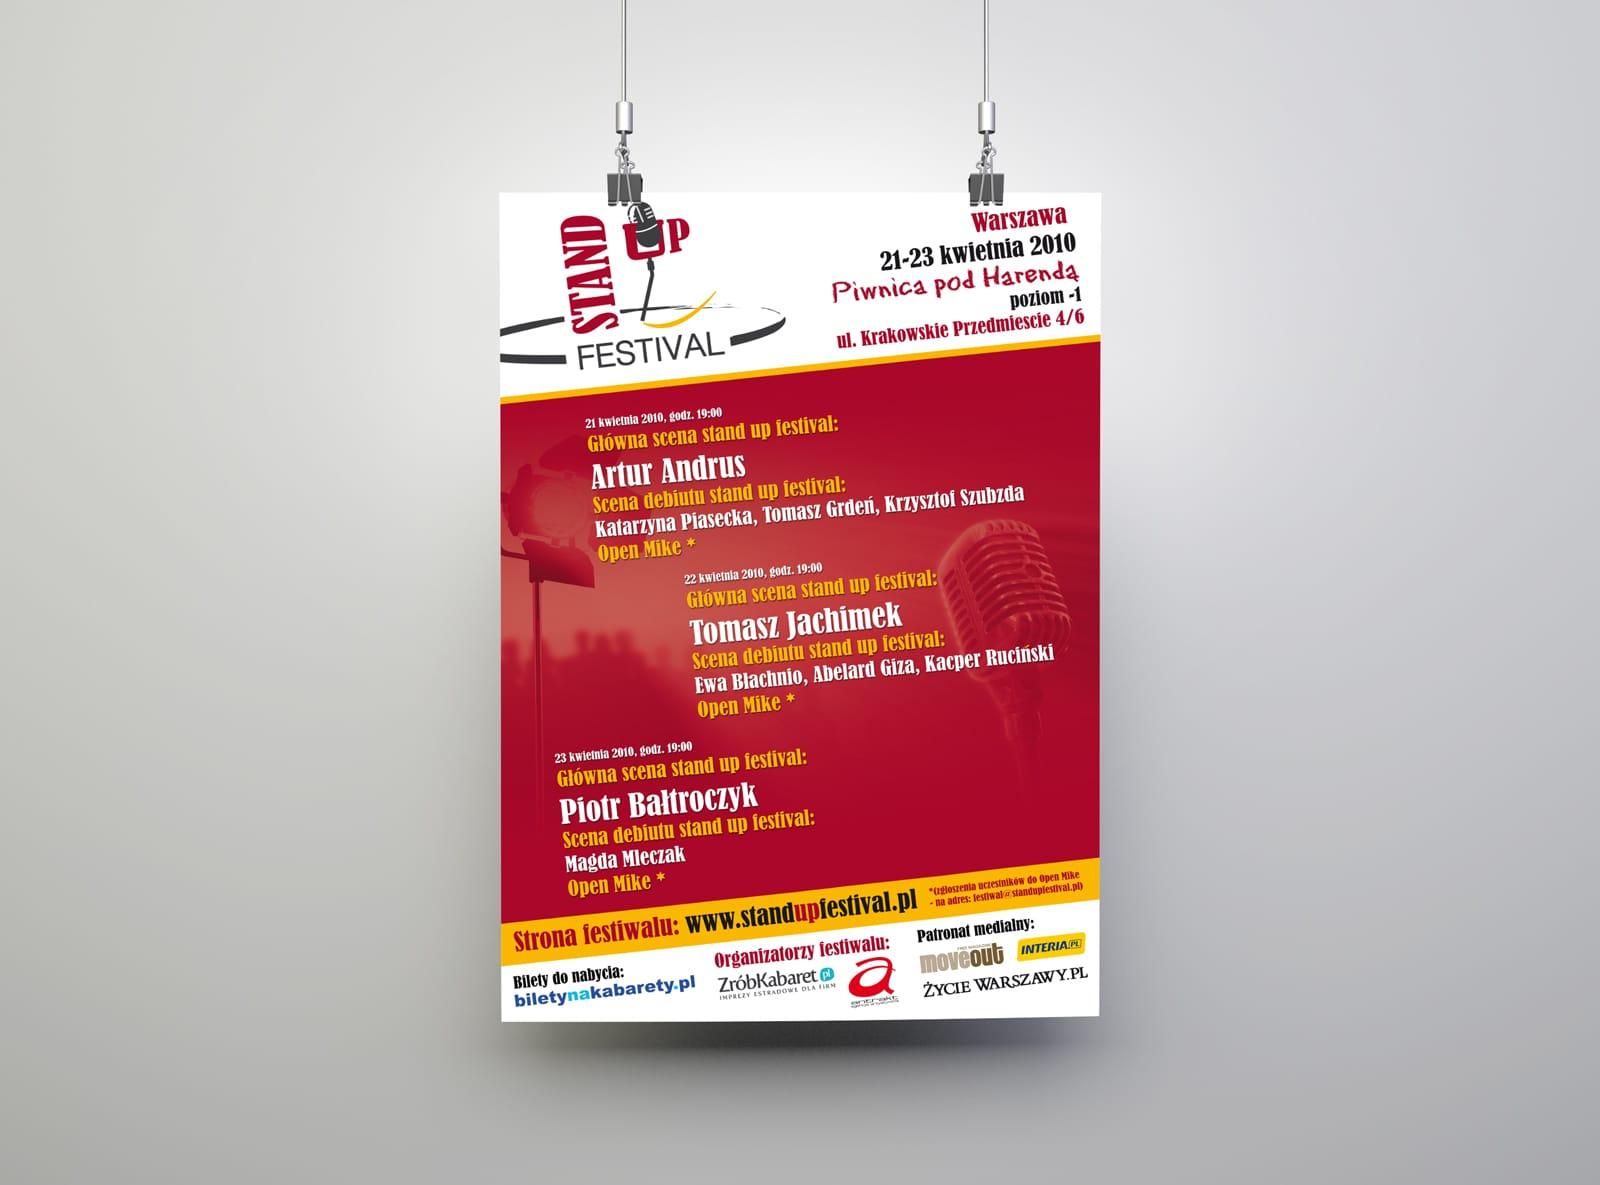 Antrakt StandUp Festival plakaty informacyjne